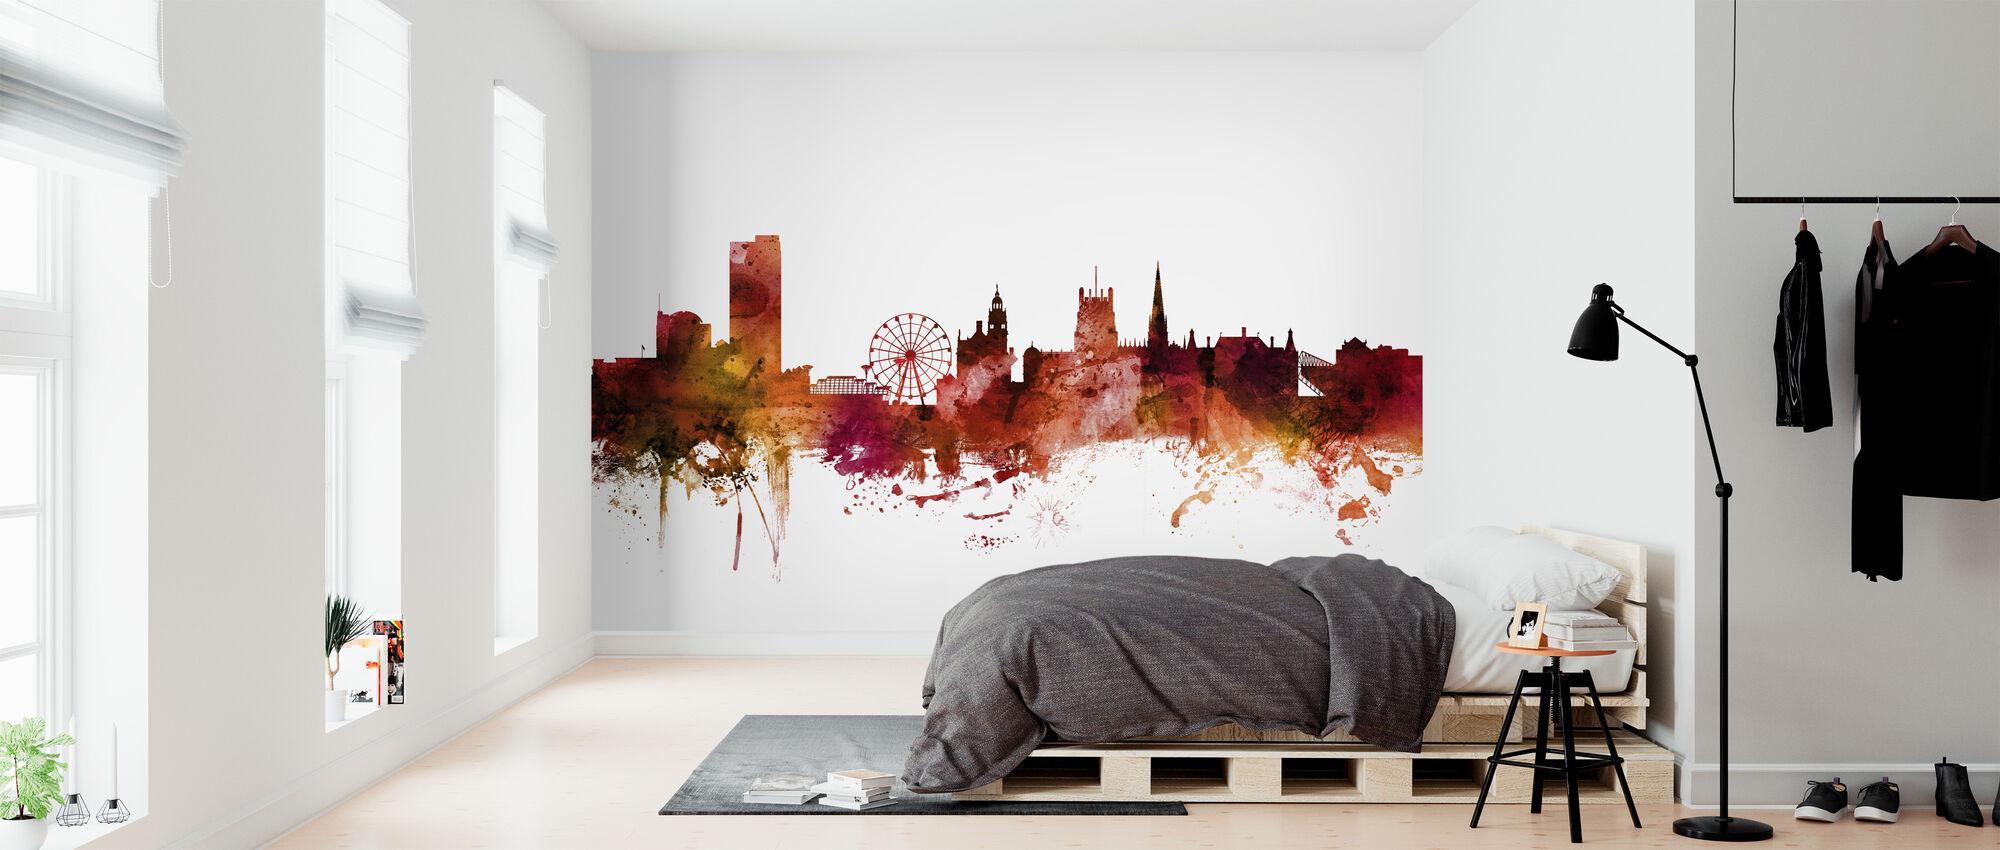 Sheffield England Skyline - Wallpaper - Bedroom